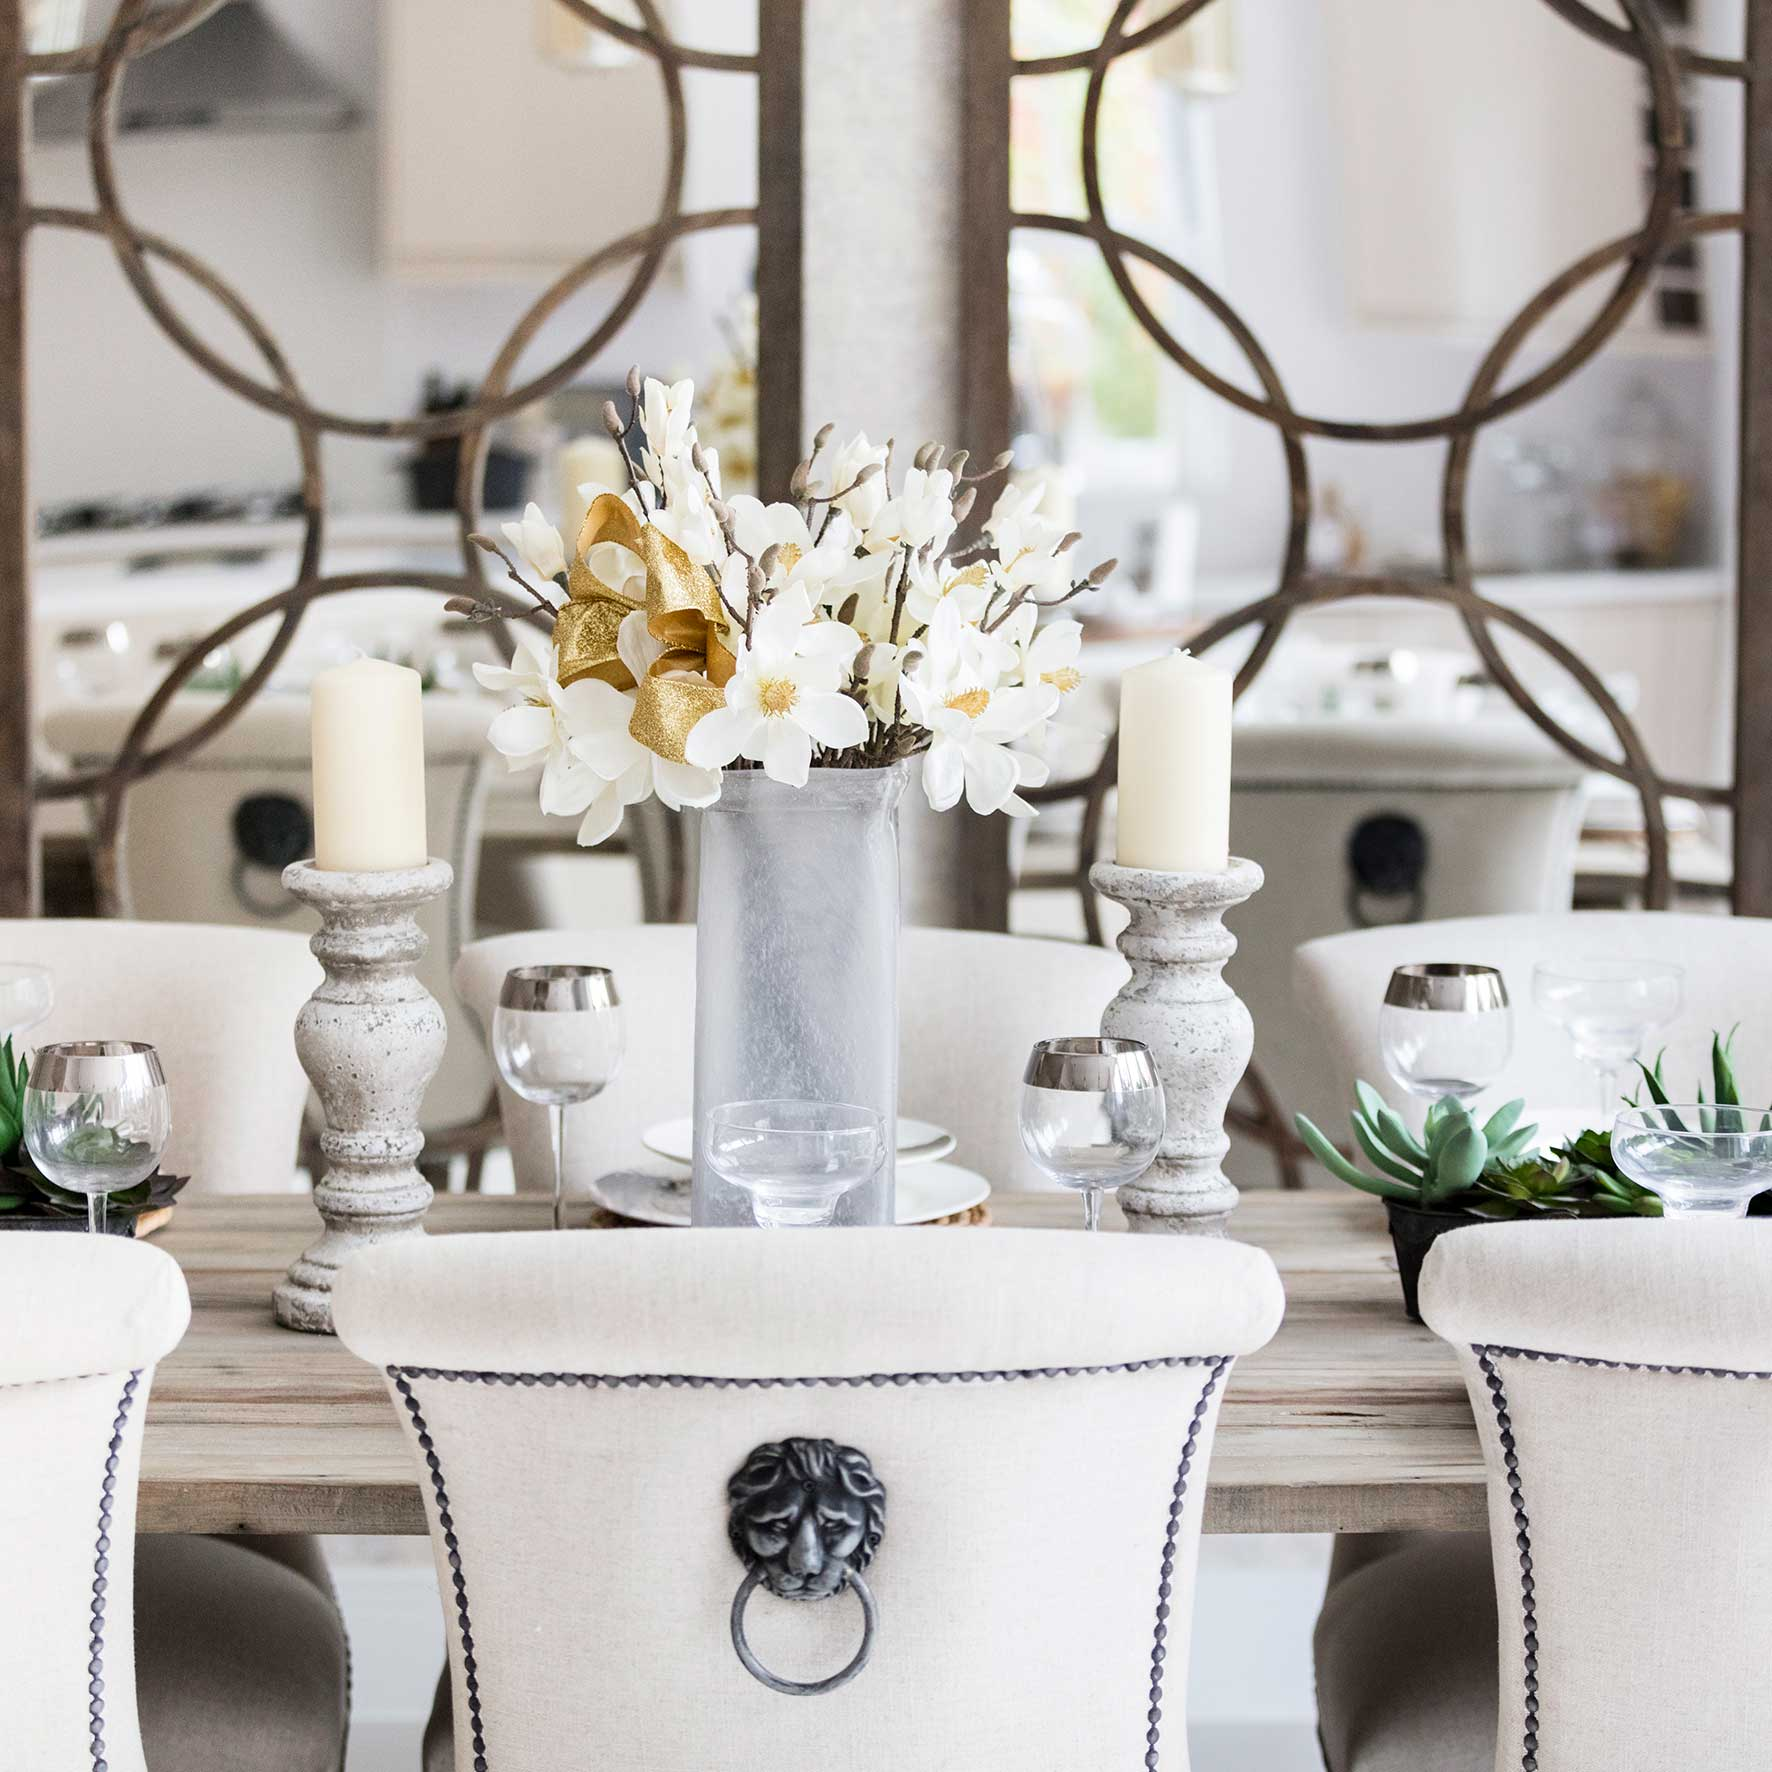 ANTLER HOMES Chamberlain Place Weybridge show home by Suna Interior Design dining.jpg